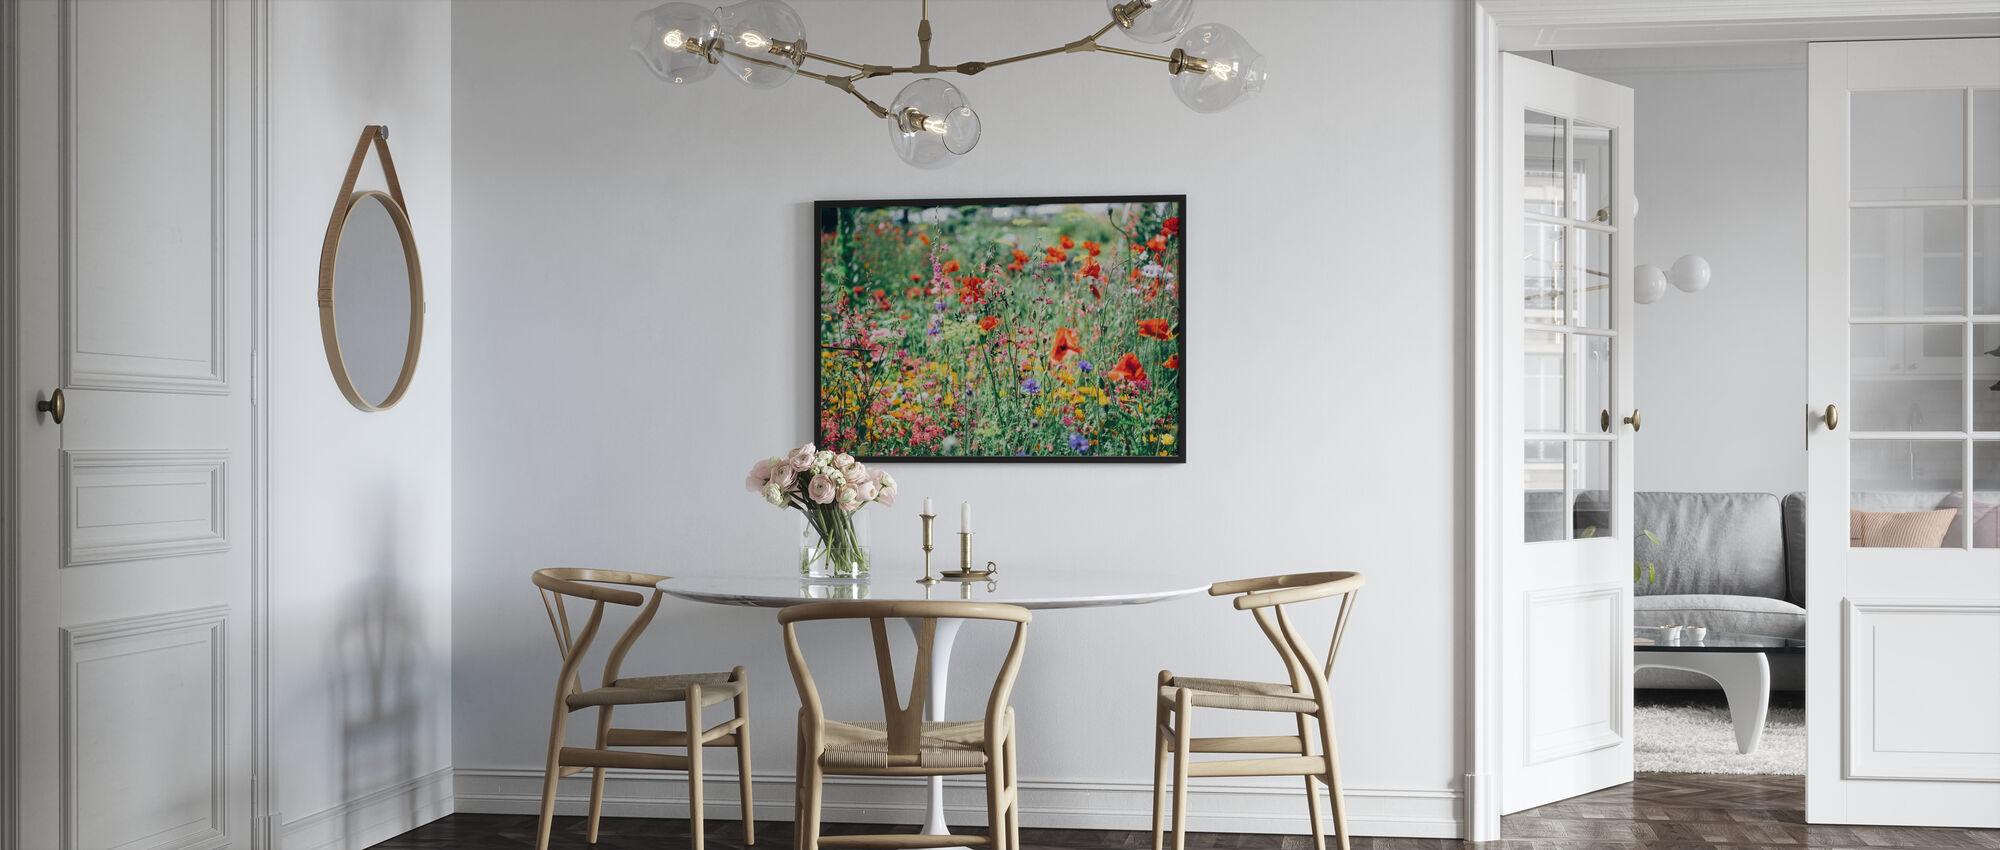 Vacker Wildflower - Poster - Kök